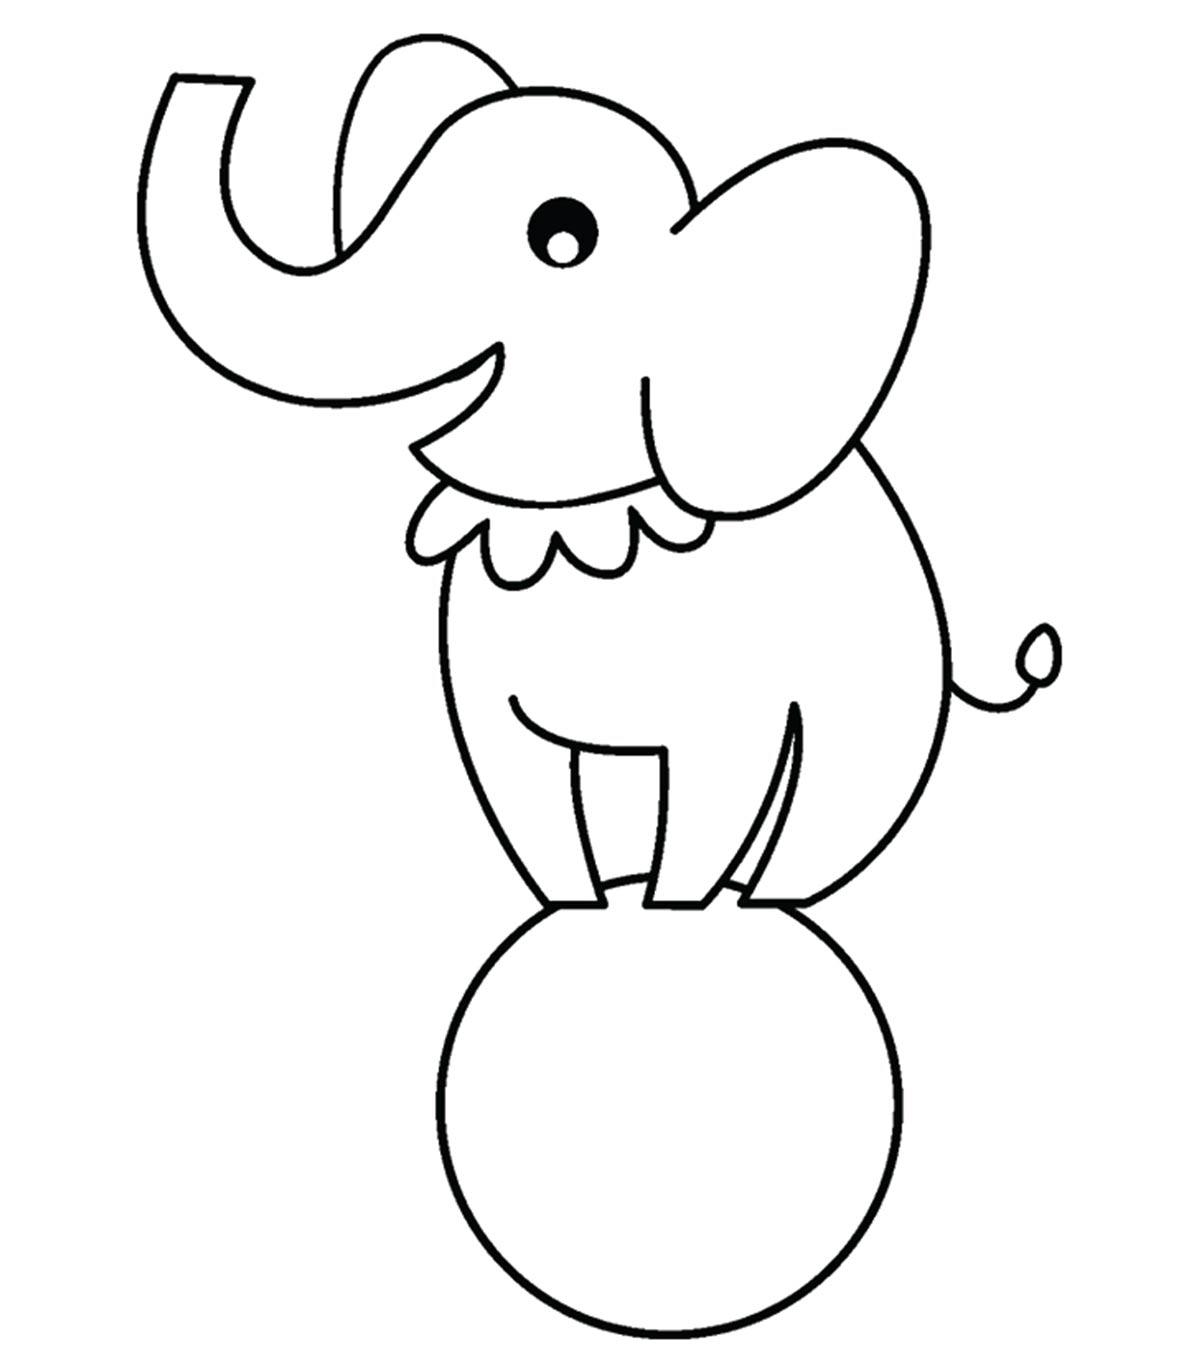 Top  Free Printable Preschool Coloring Pages Online